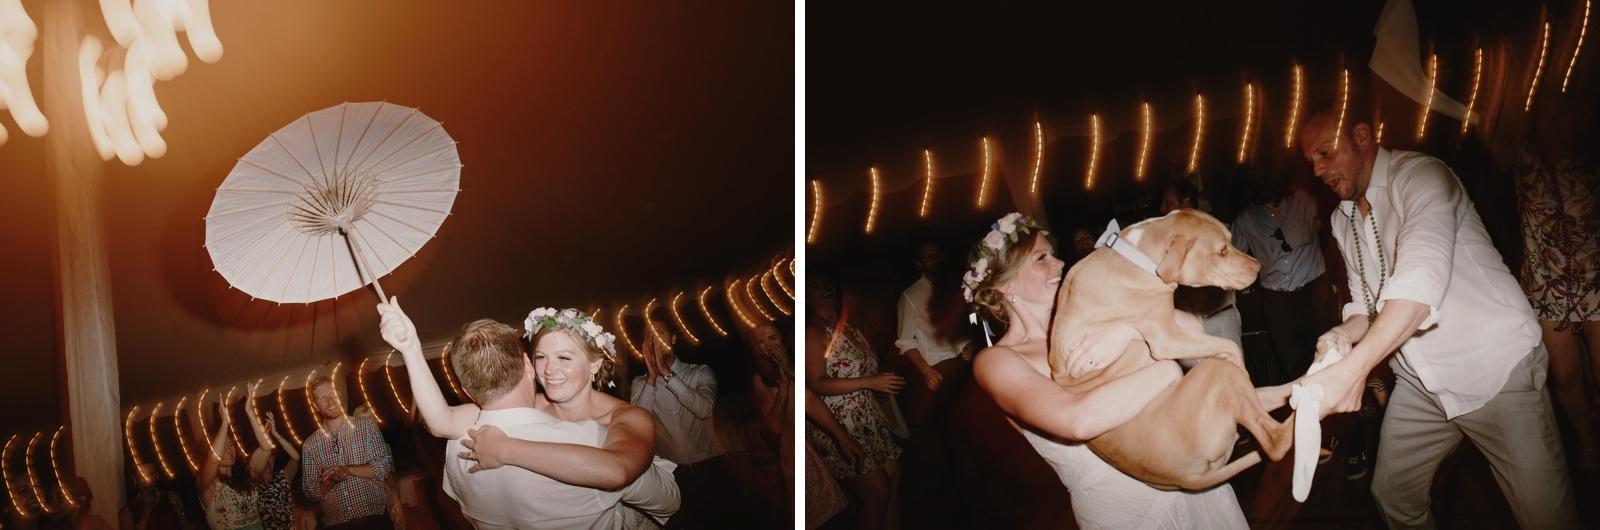 Backyard_Vashon_Island_Wedding_Kristen_Marie_Parker076.JPG